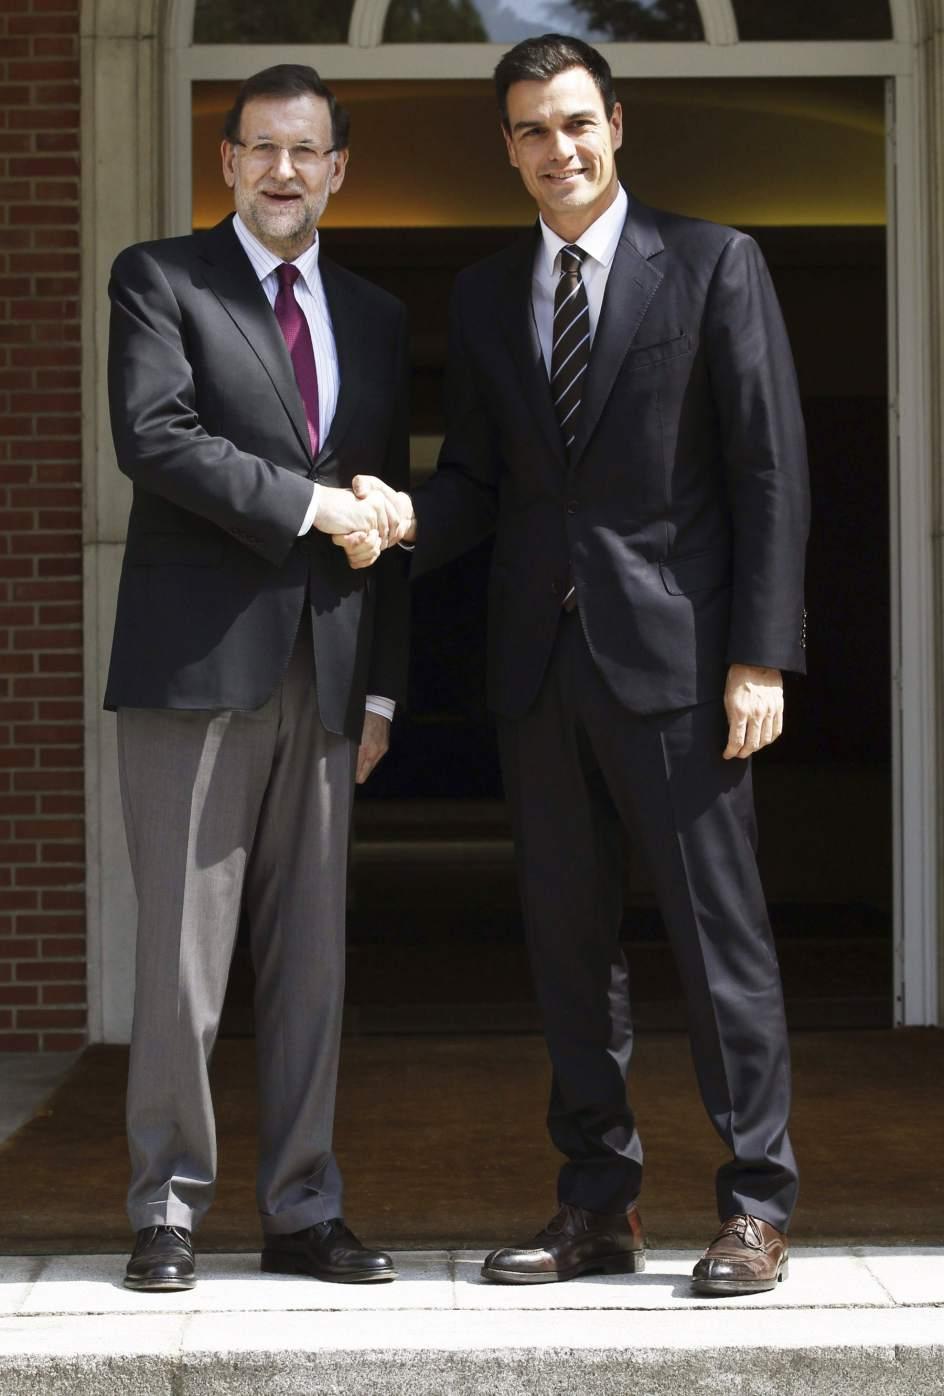 ¿Cuánto mide Mariano Rajoy? - Altura - Real height 183884-944-1396